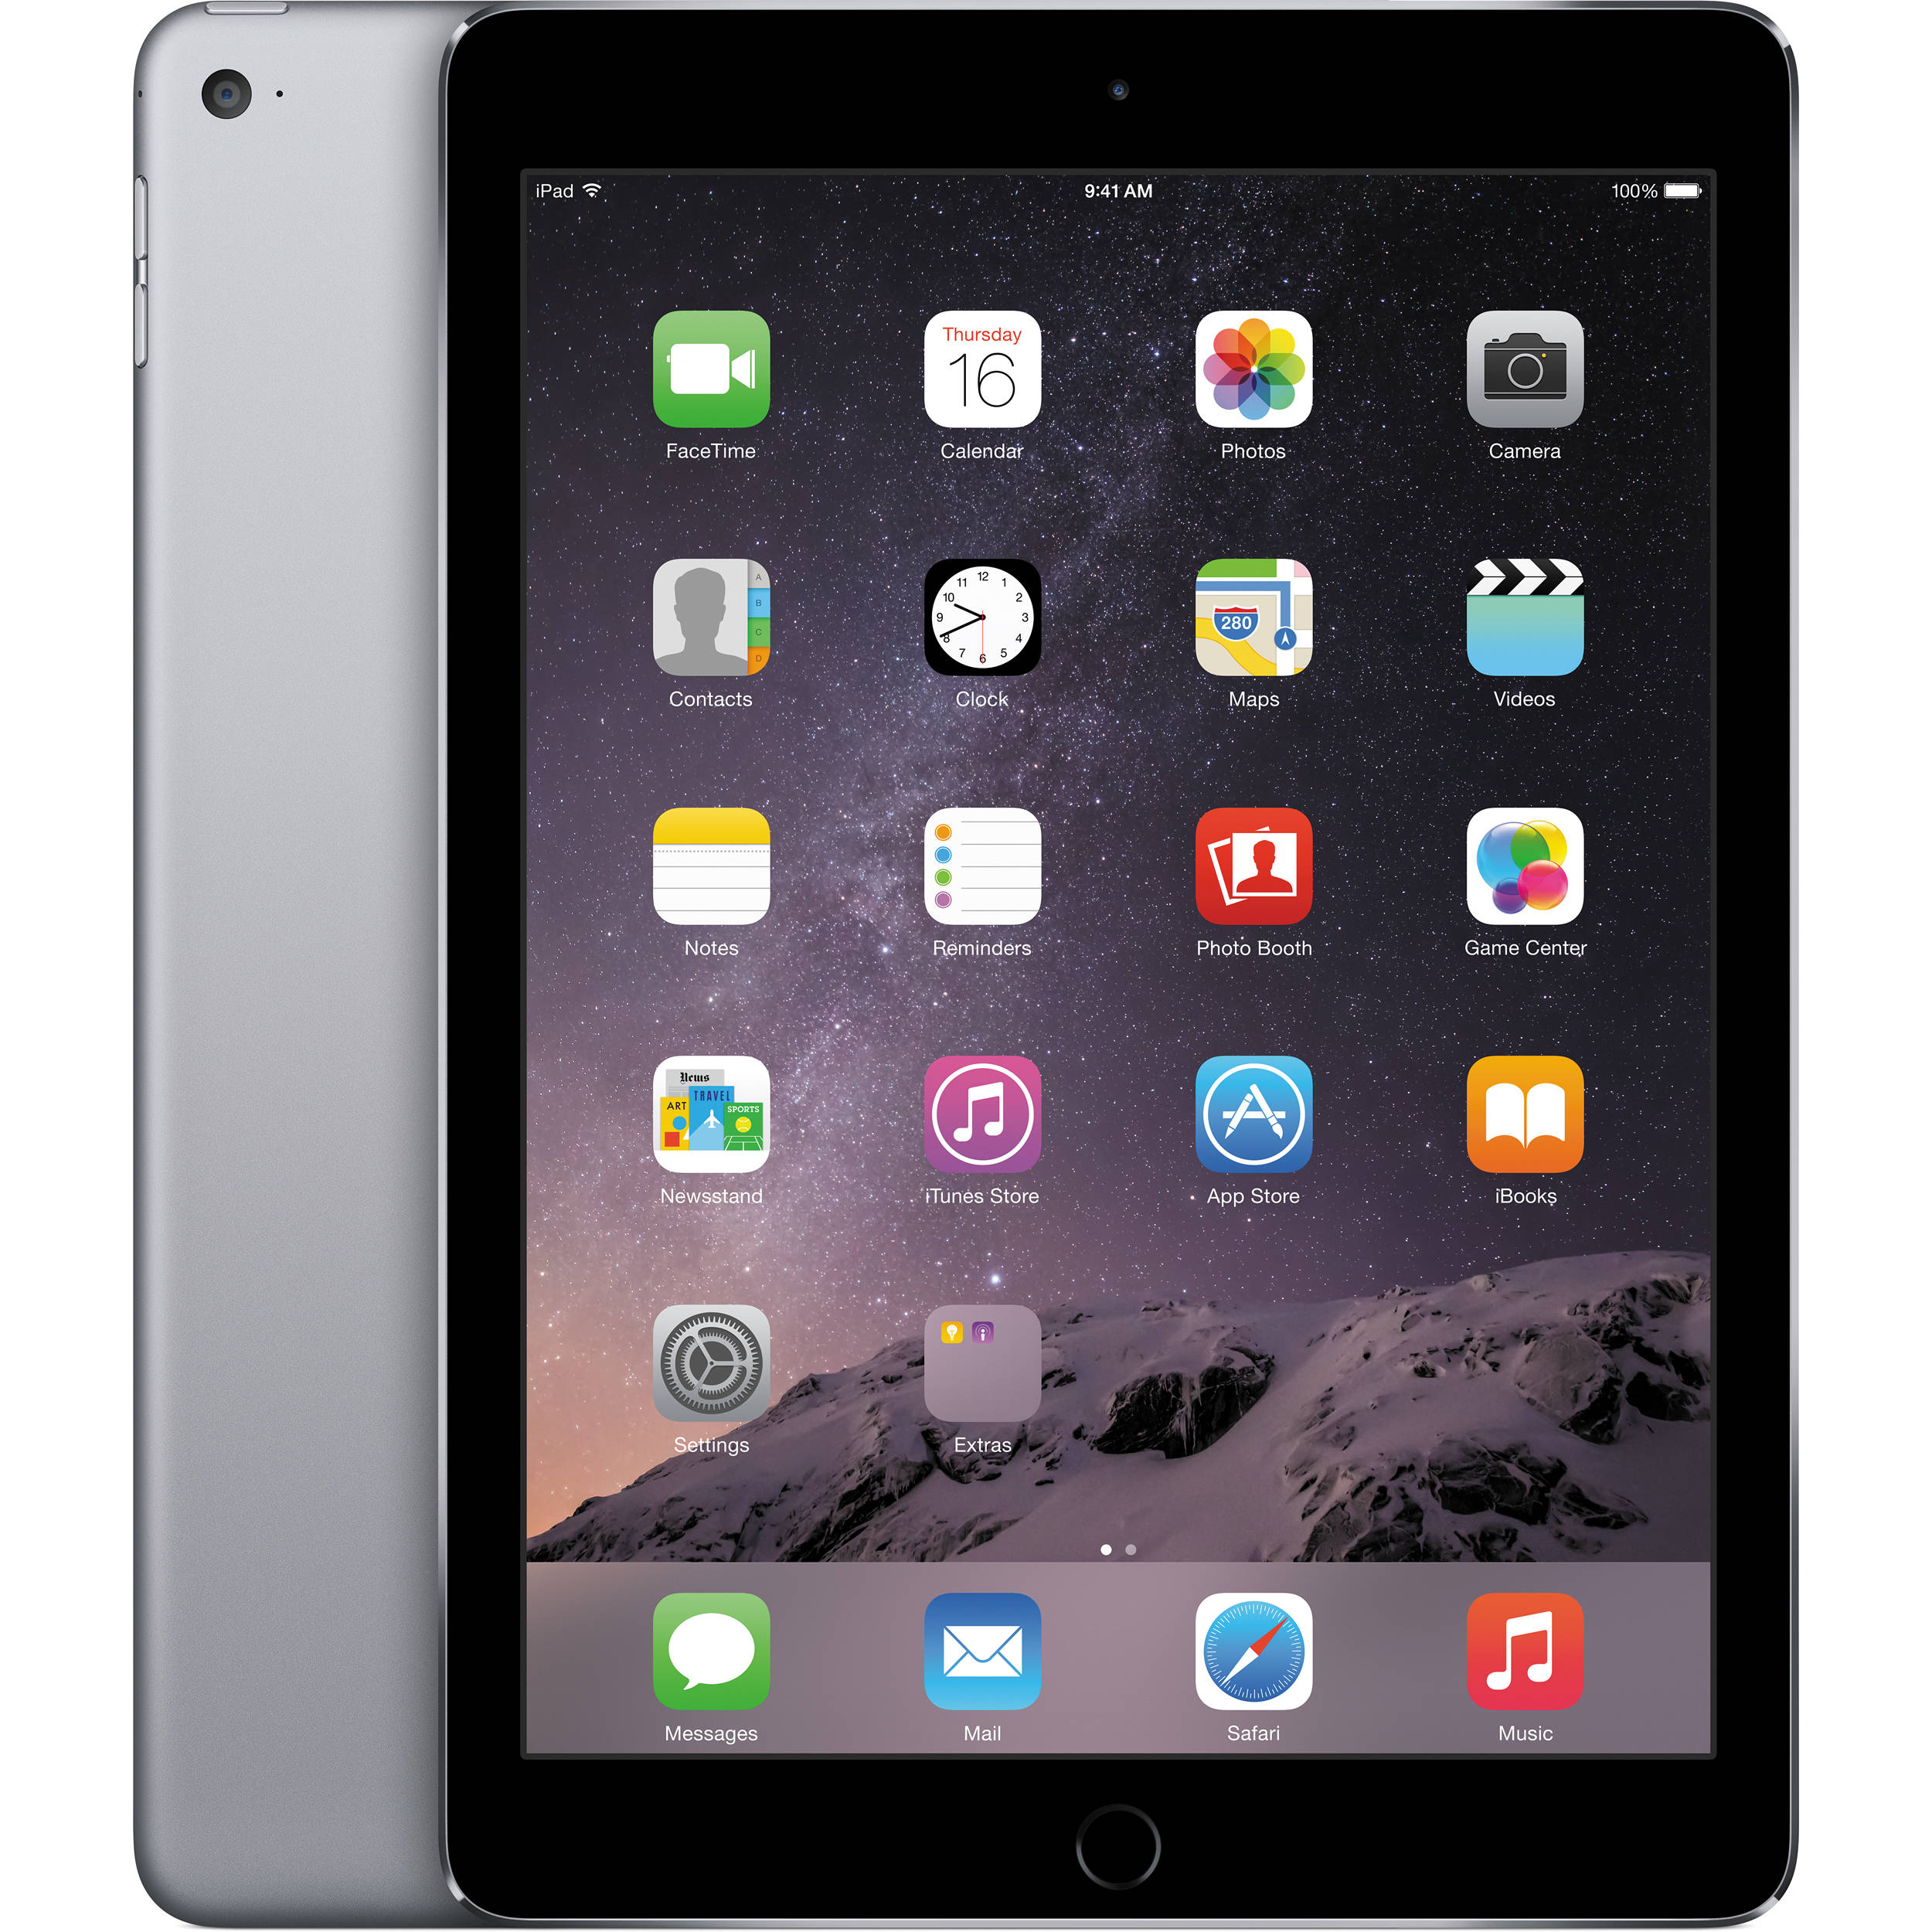 Apple iPad Air - 16GB - White Silver - (Retina Display) - B+ Grade Tweedehands